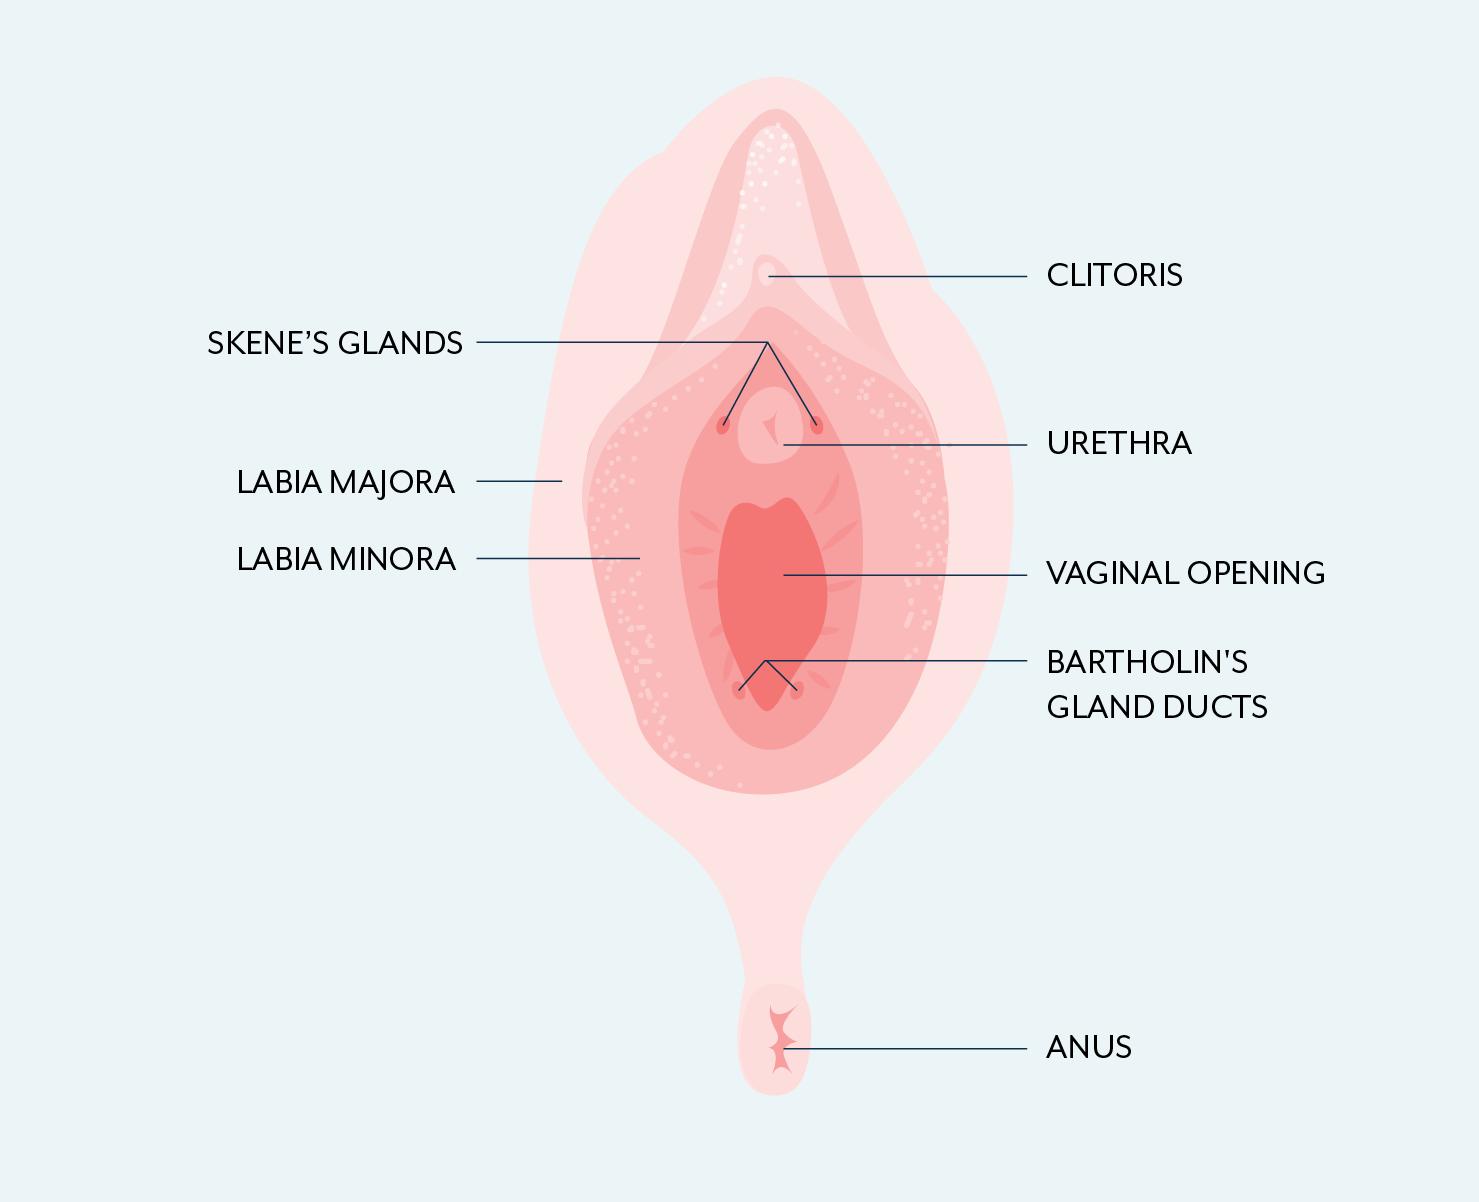 Skene's gland anatomy